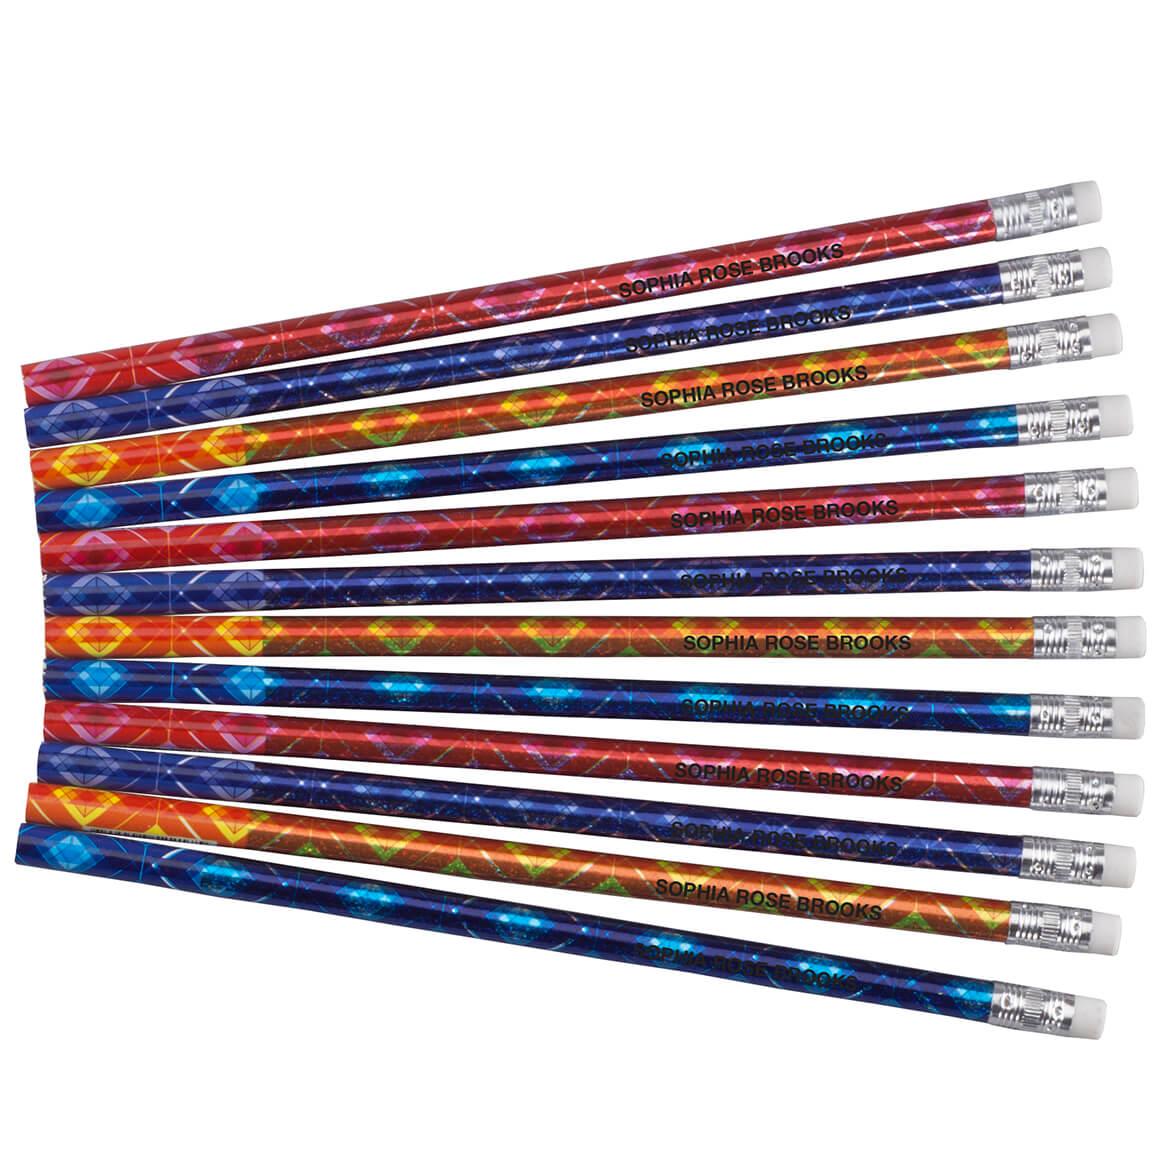 Personalized Bedazzled Glitz Pencils Set Of 12